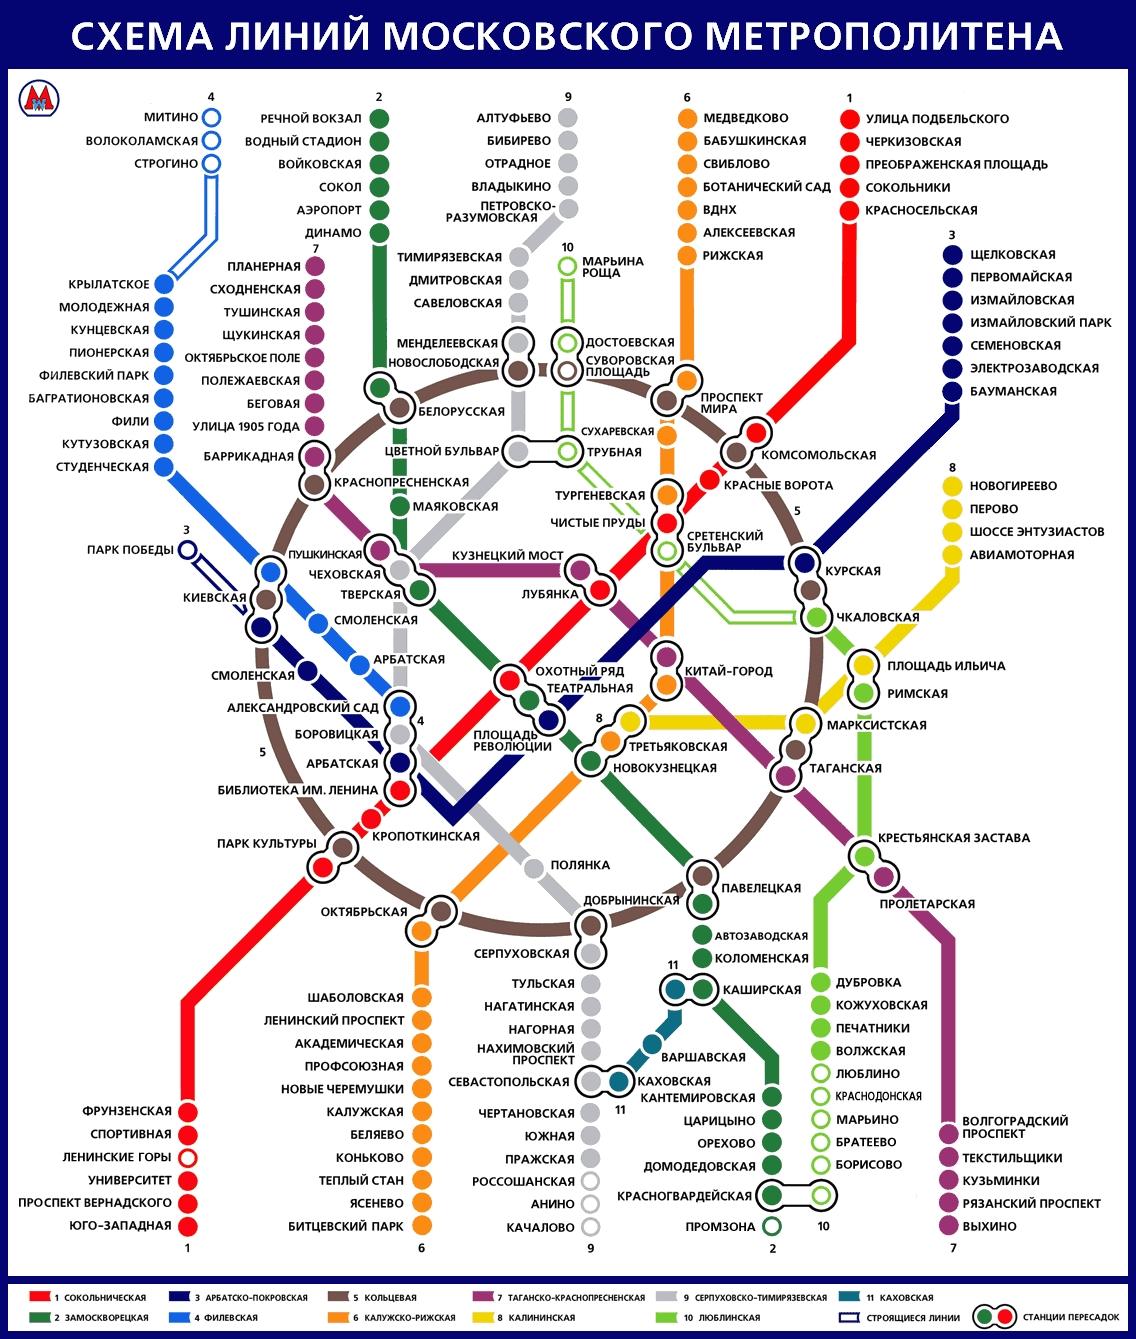 знакомства в москве с указанием метро